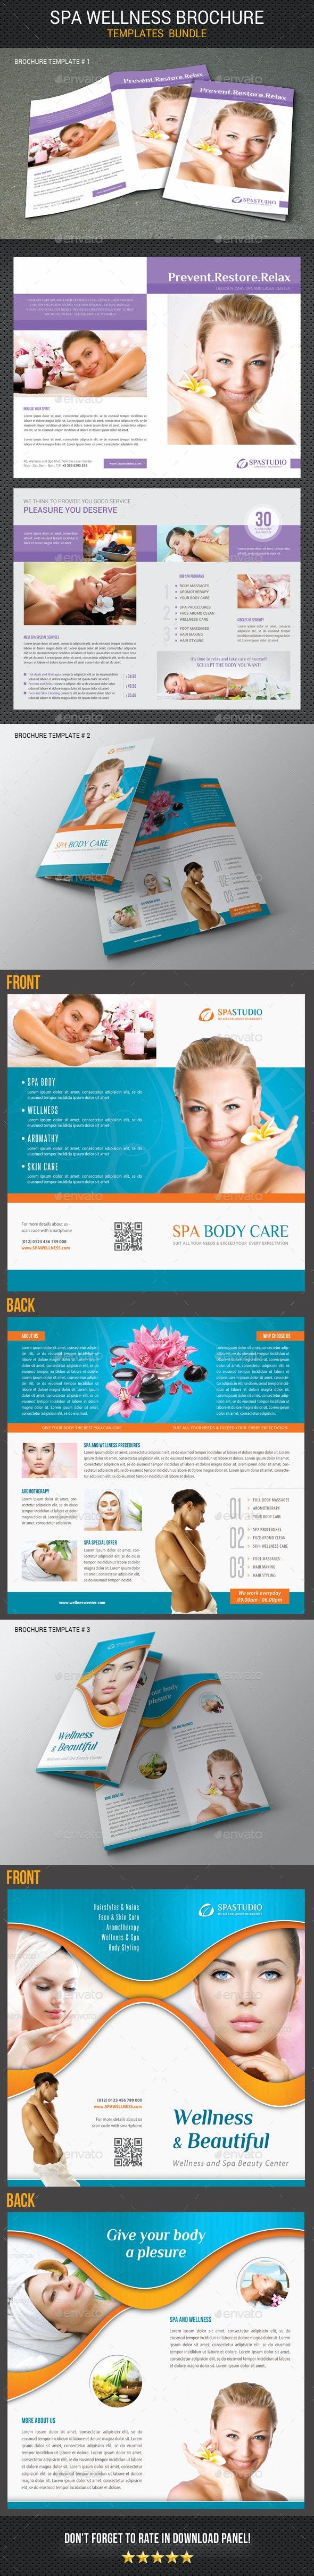 Spa Wellness Brochure Bundle 02 - Corporate Brochures